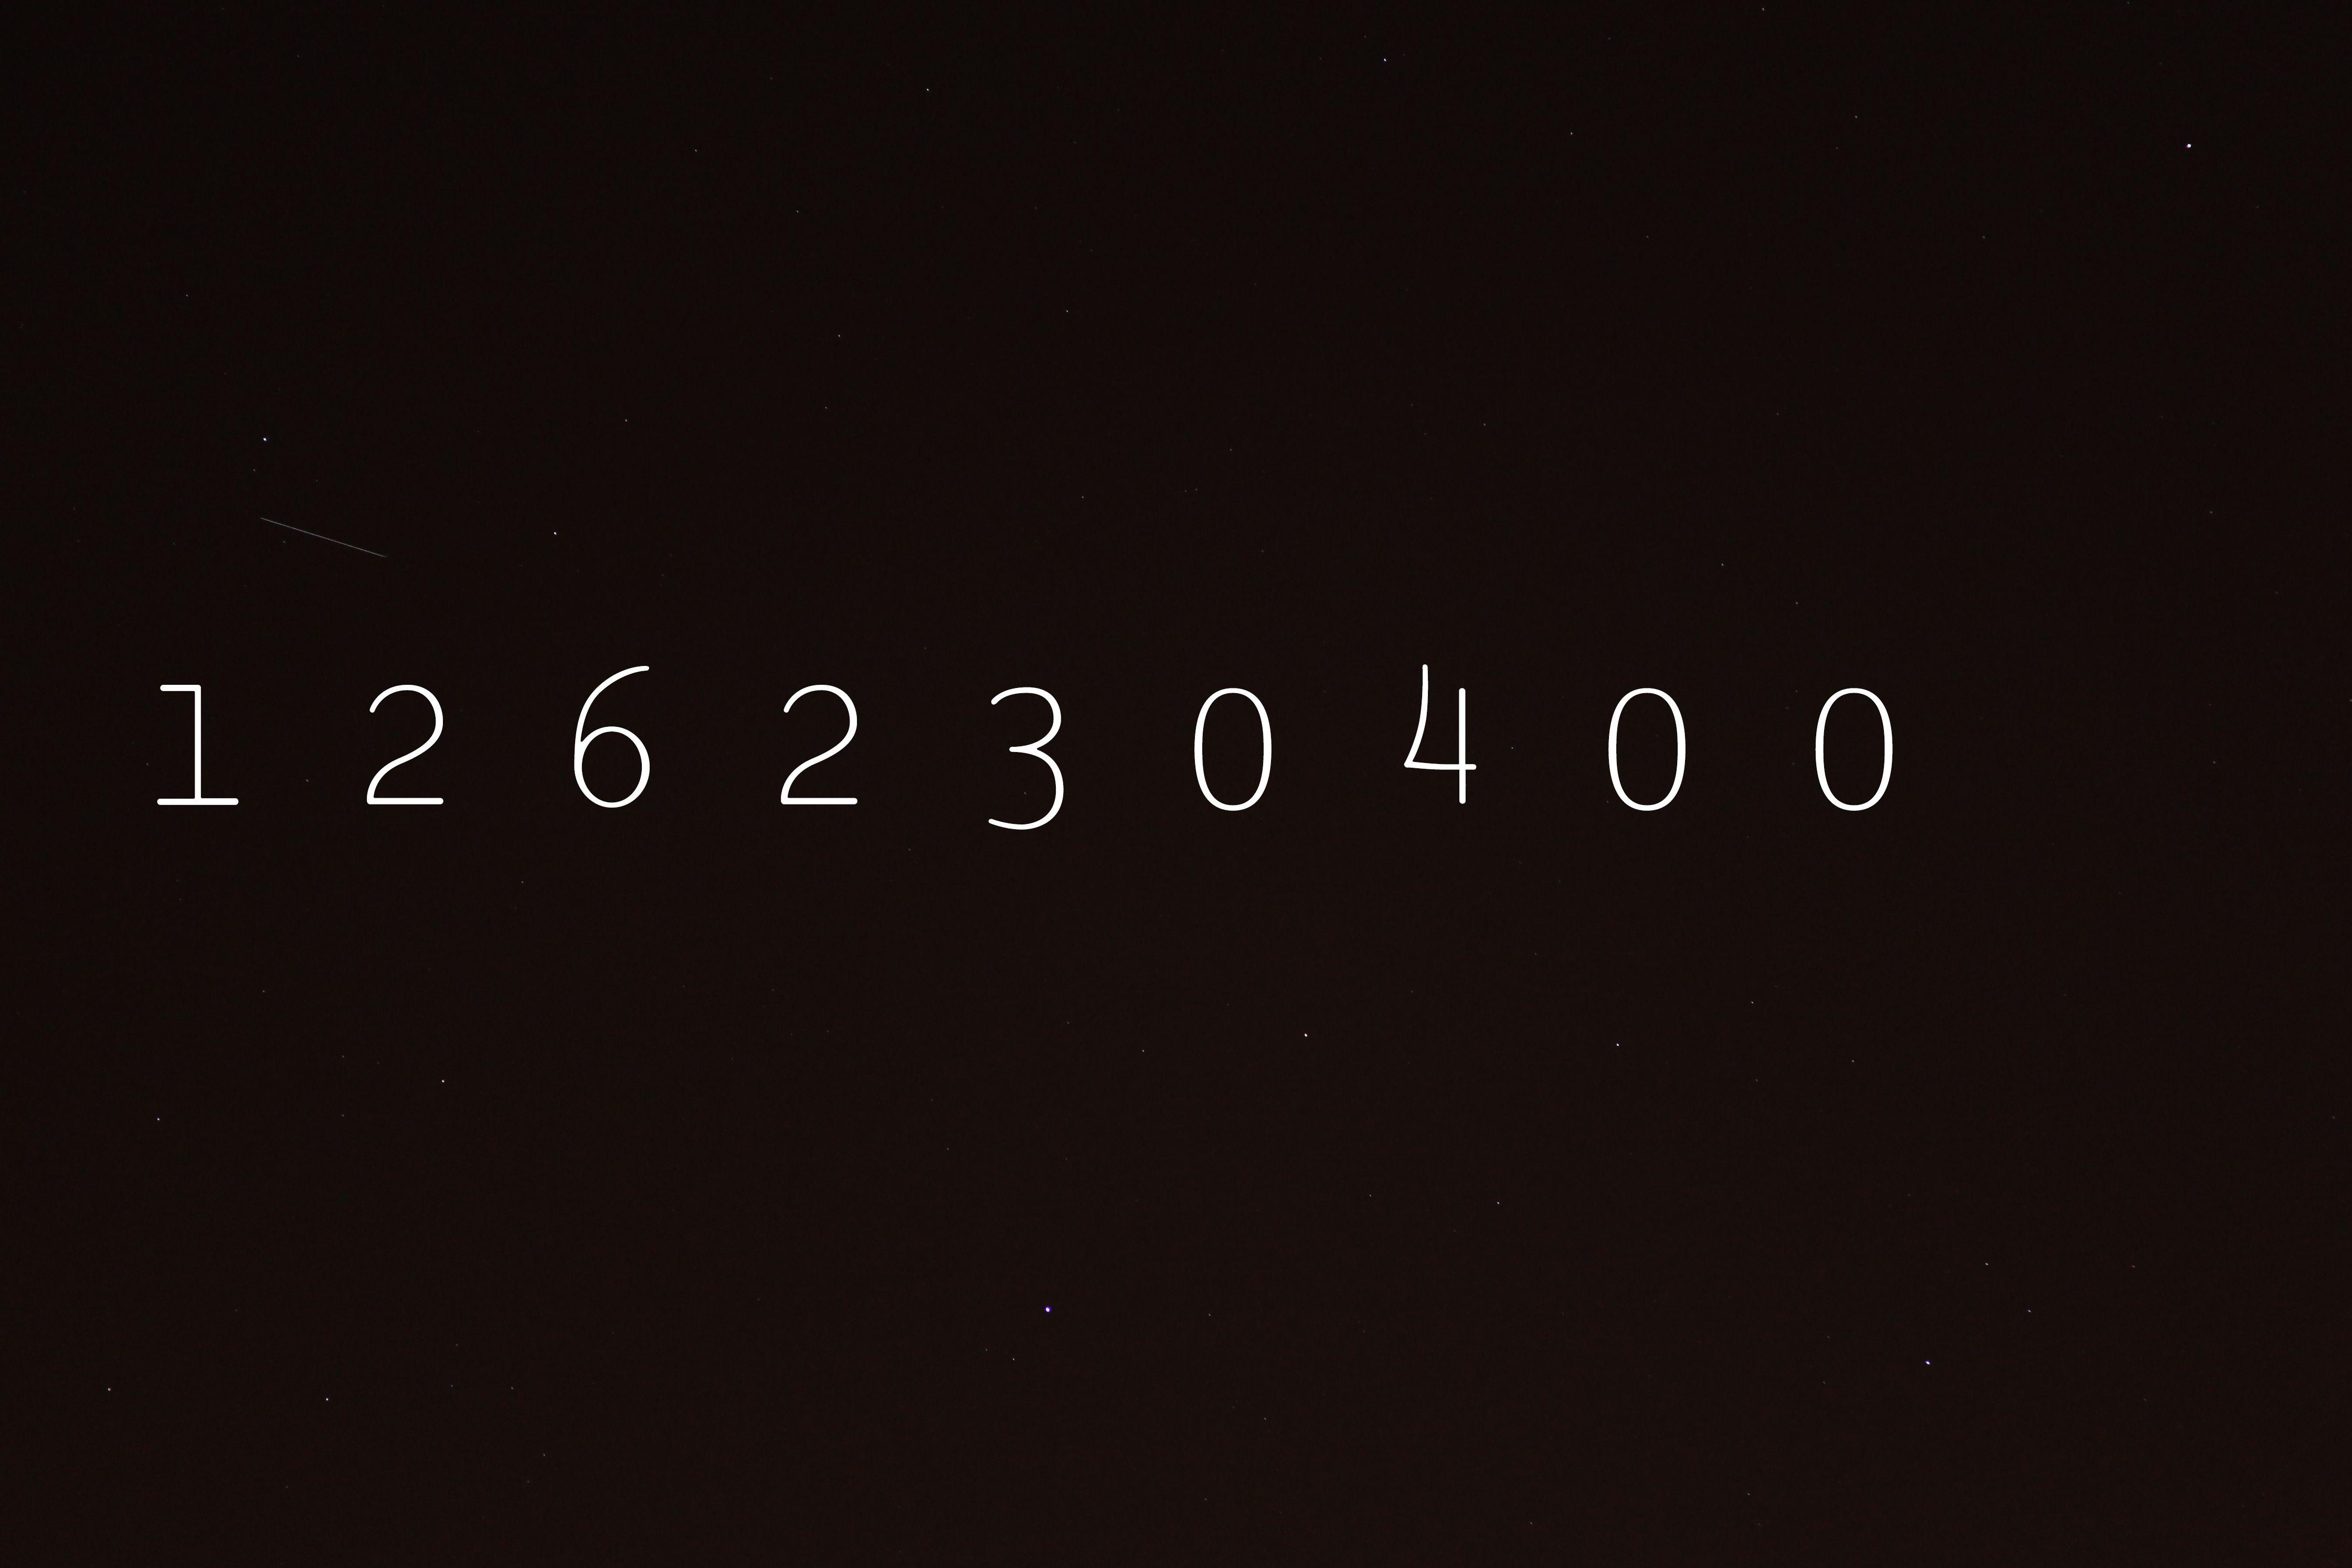 Leap Second, 31 December 1973 - 23:59:60